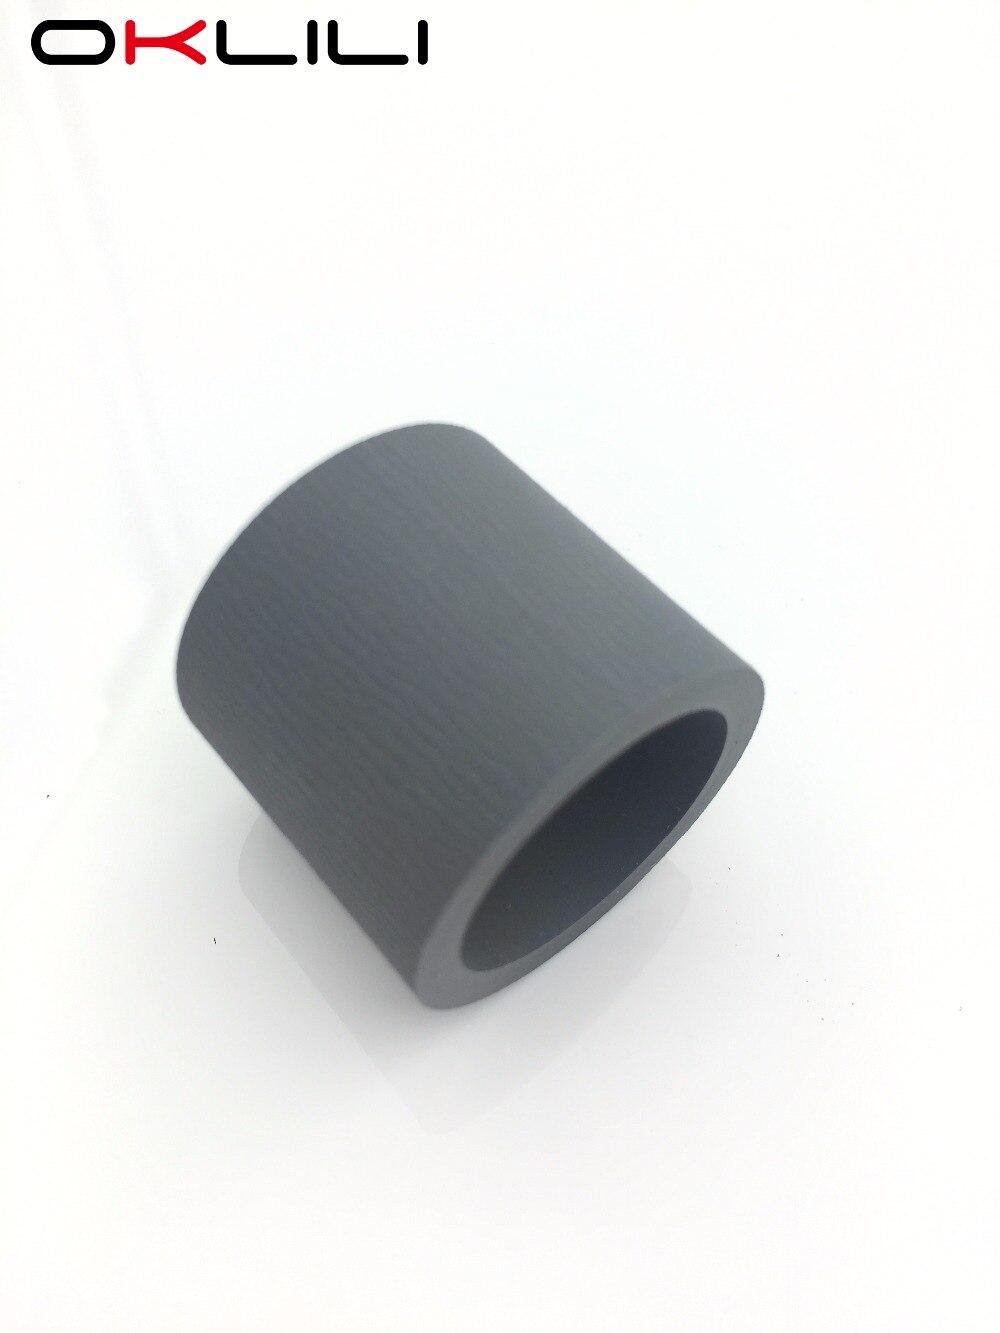 100X Pickup Roller Feed Roller tire for HP Officejet 8100 8600 8610 8620 8625 8630 8700